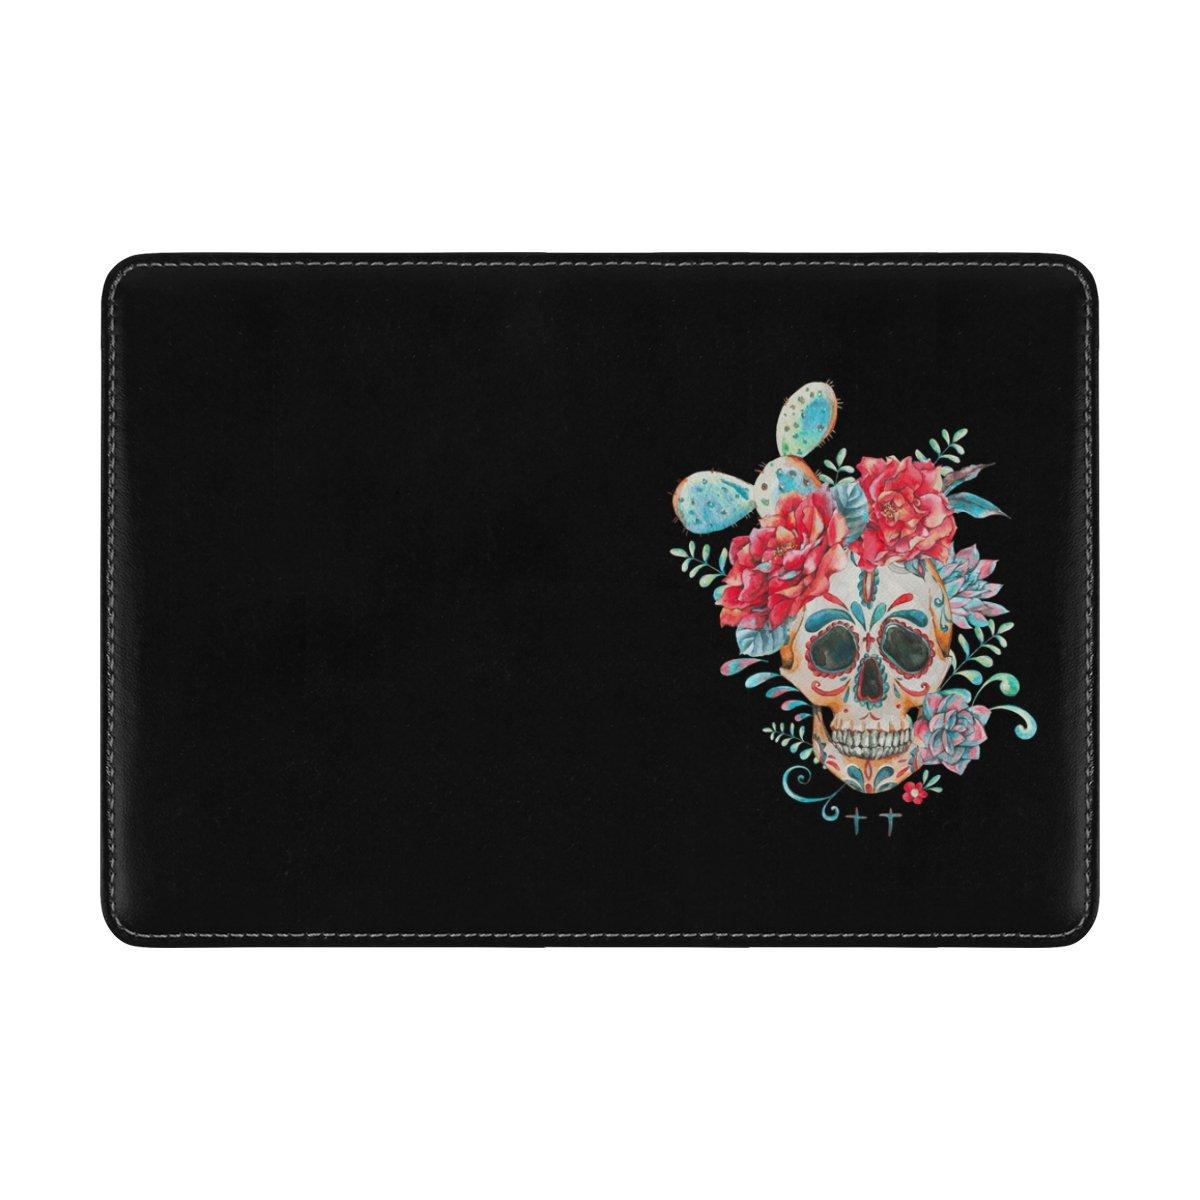 ALAZA Cactus Rose Flower Sugar Skull PU Leather Passport Holder Cover Case Travel One Pocket